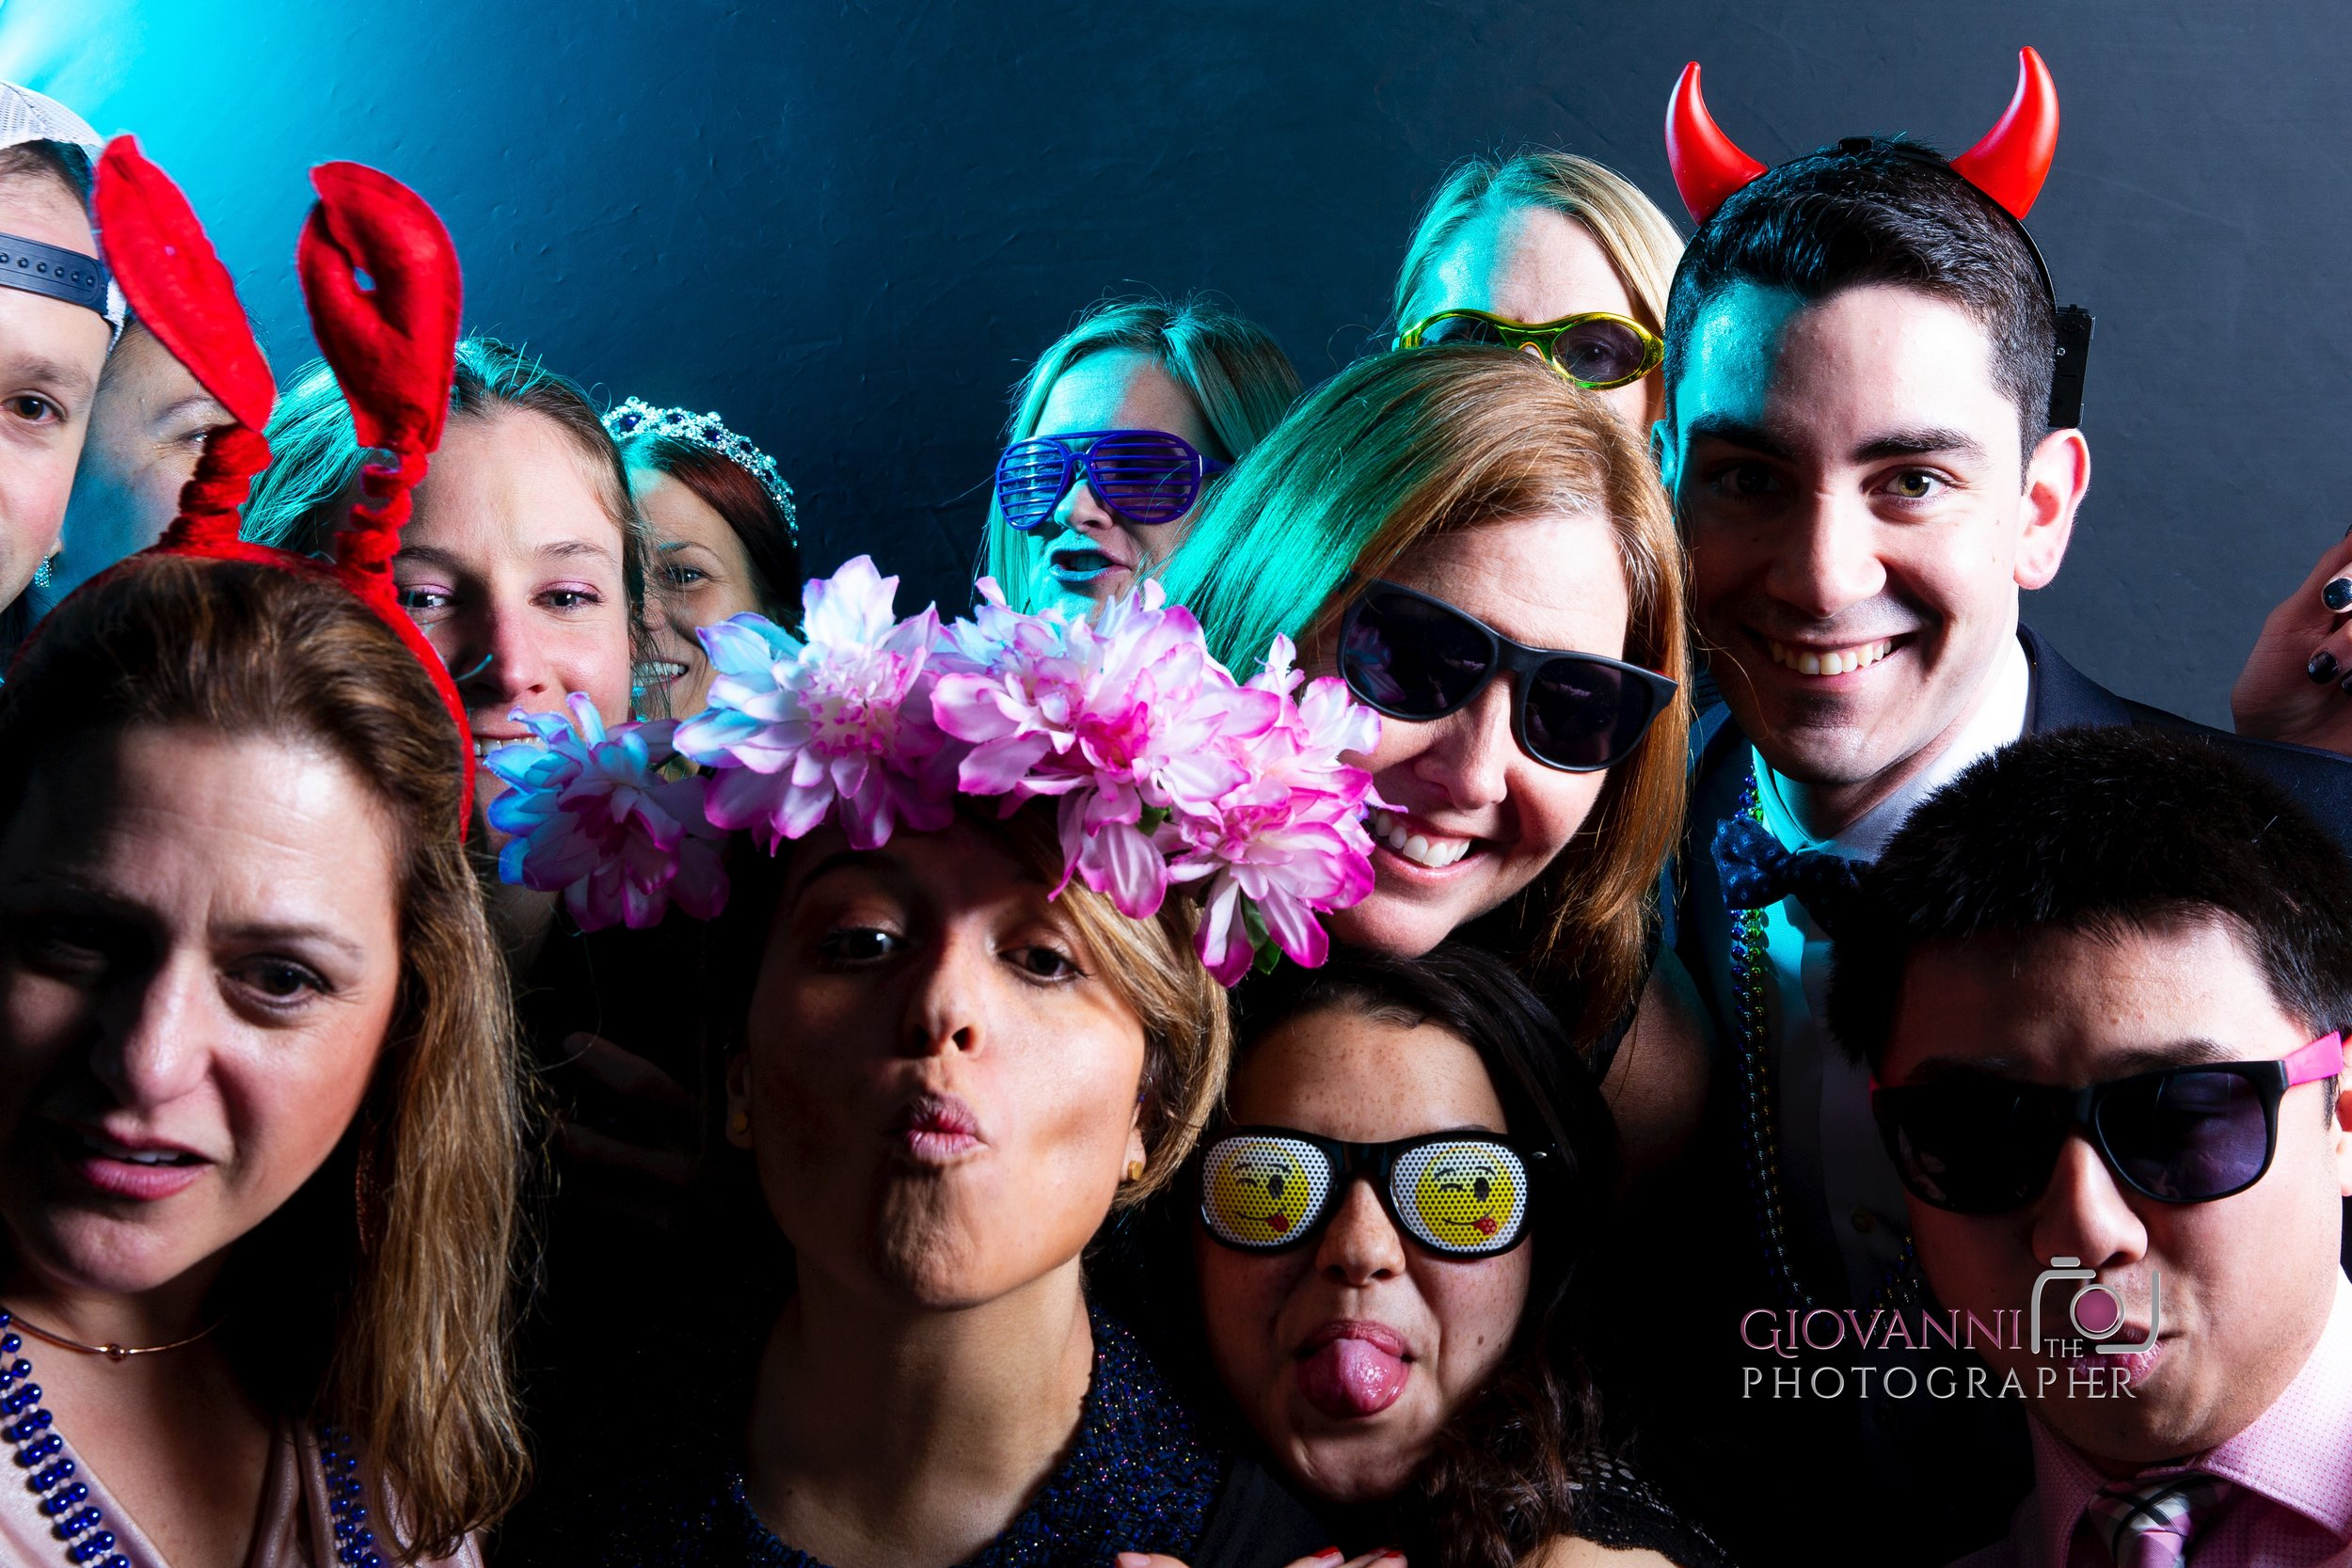 8C2A7021+Giovanni The Photographer+Best Boston Photo Booth Rental+Event+Scholars Boston WM100.jpg